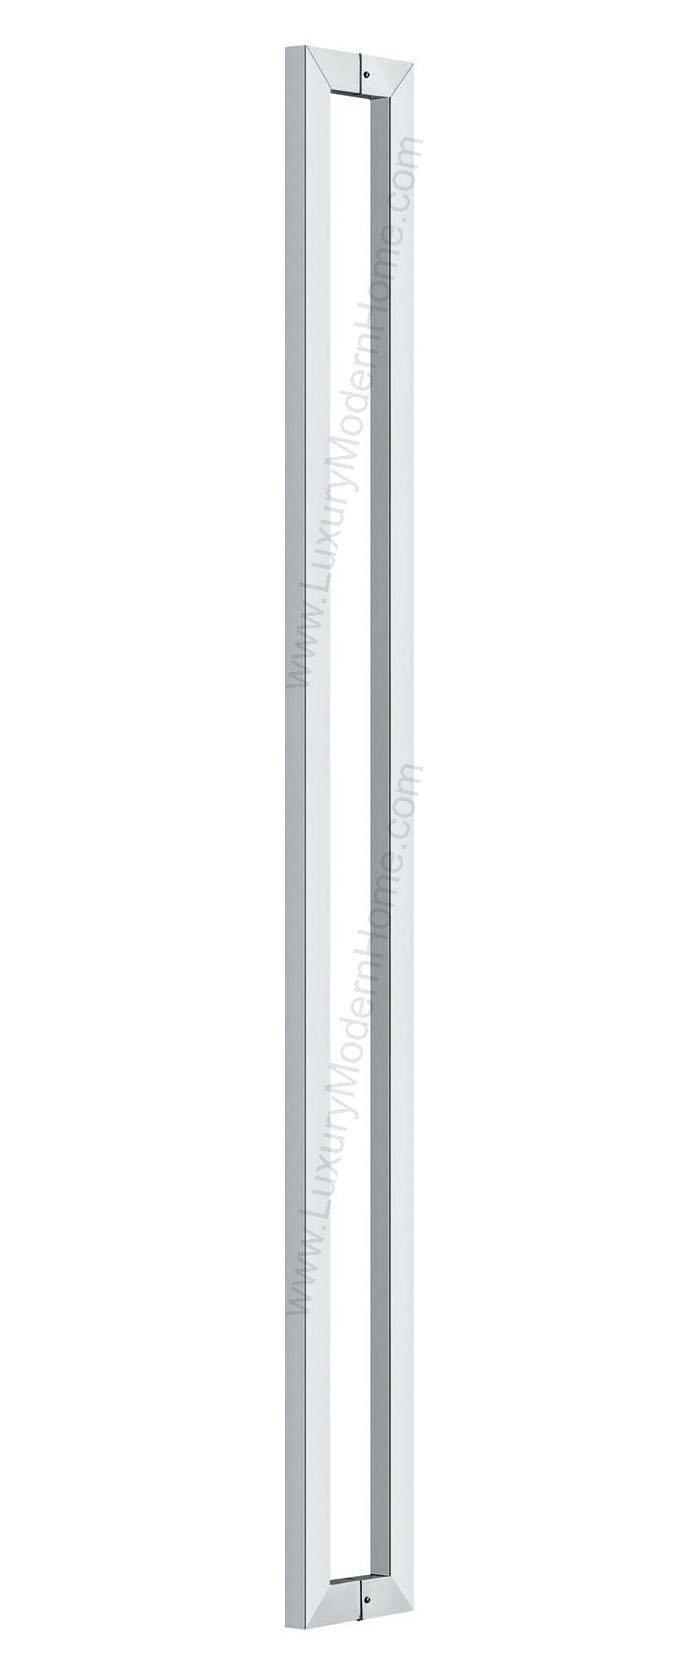 dh - 36'' Rectangular Tube Pull Shower Door Handle Square Stainless Steel 304